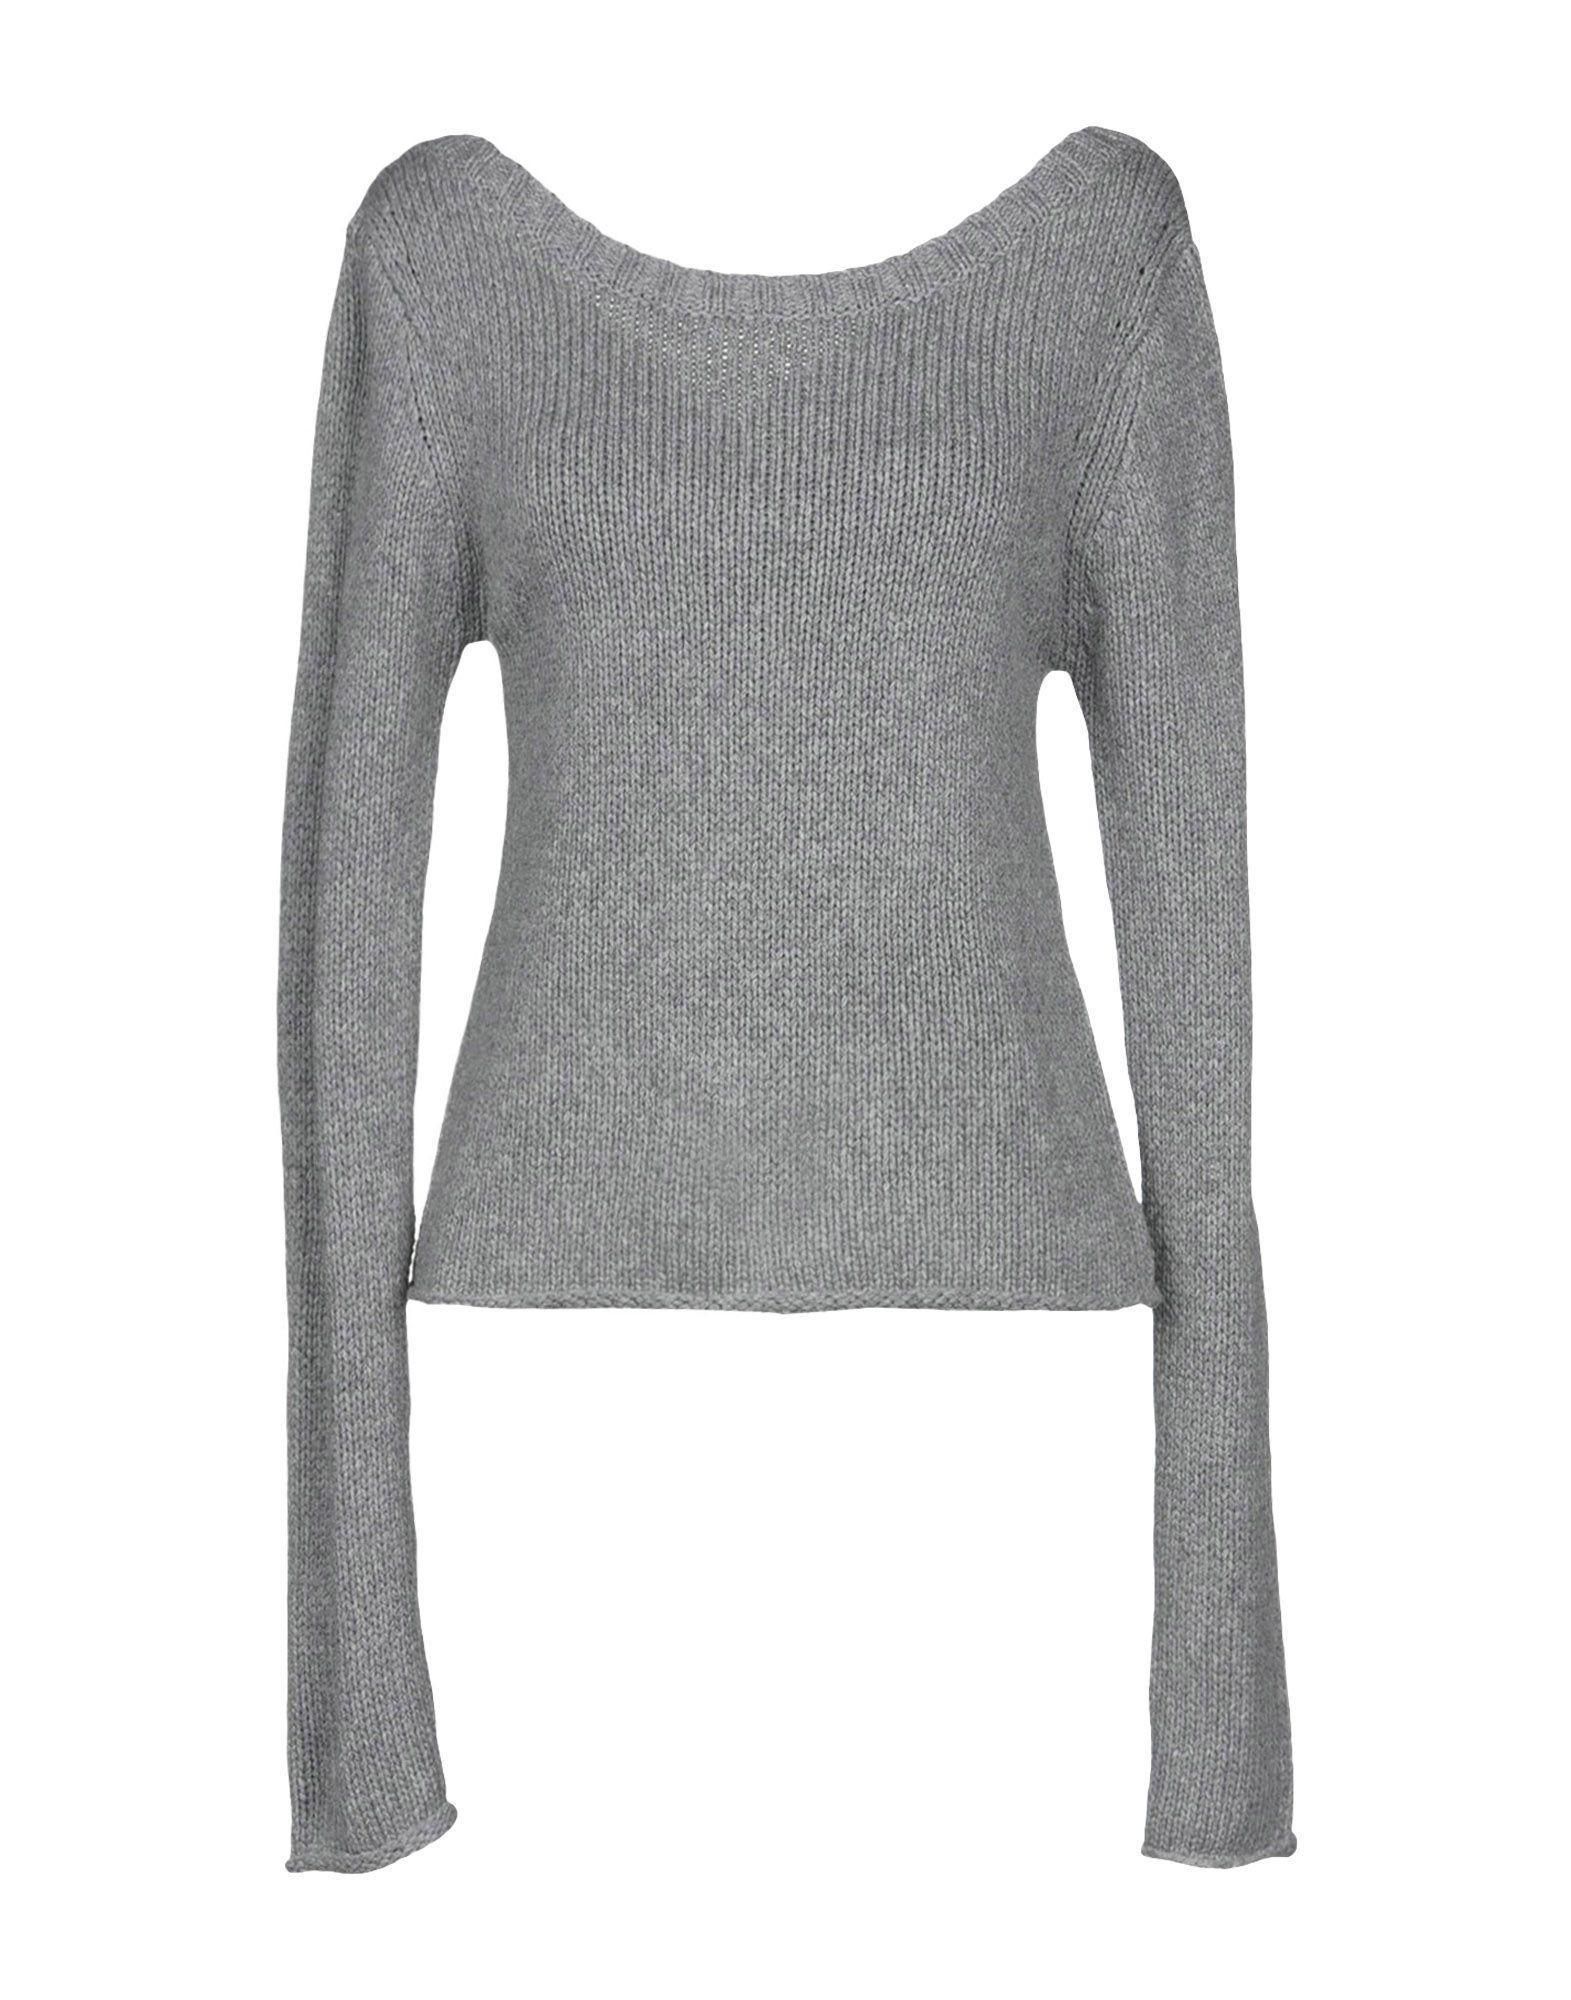 Derek Lam 10 Crosby Sweater In Grey